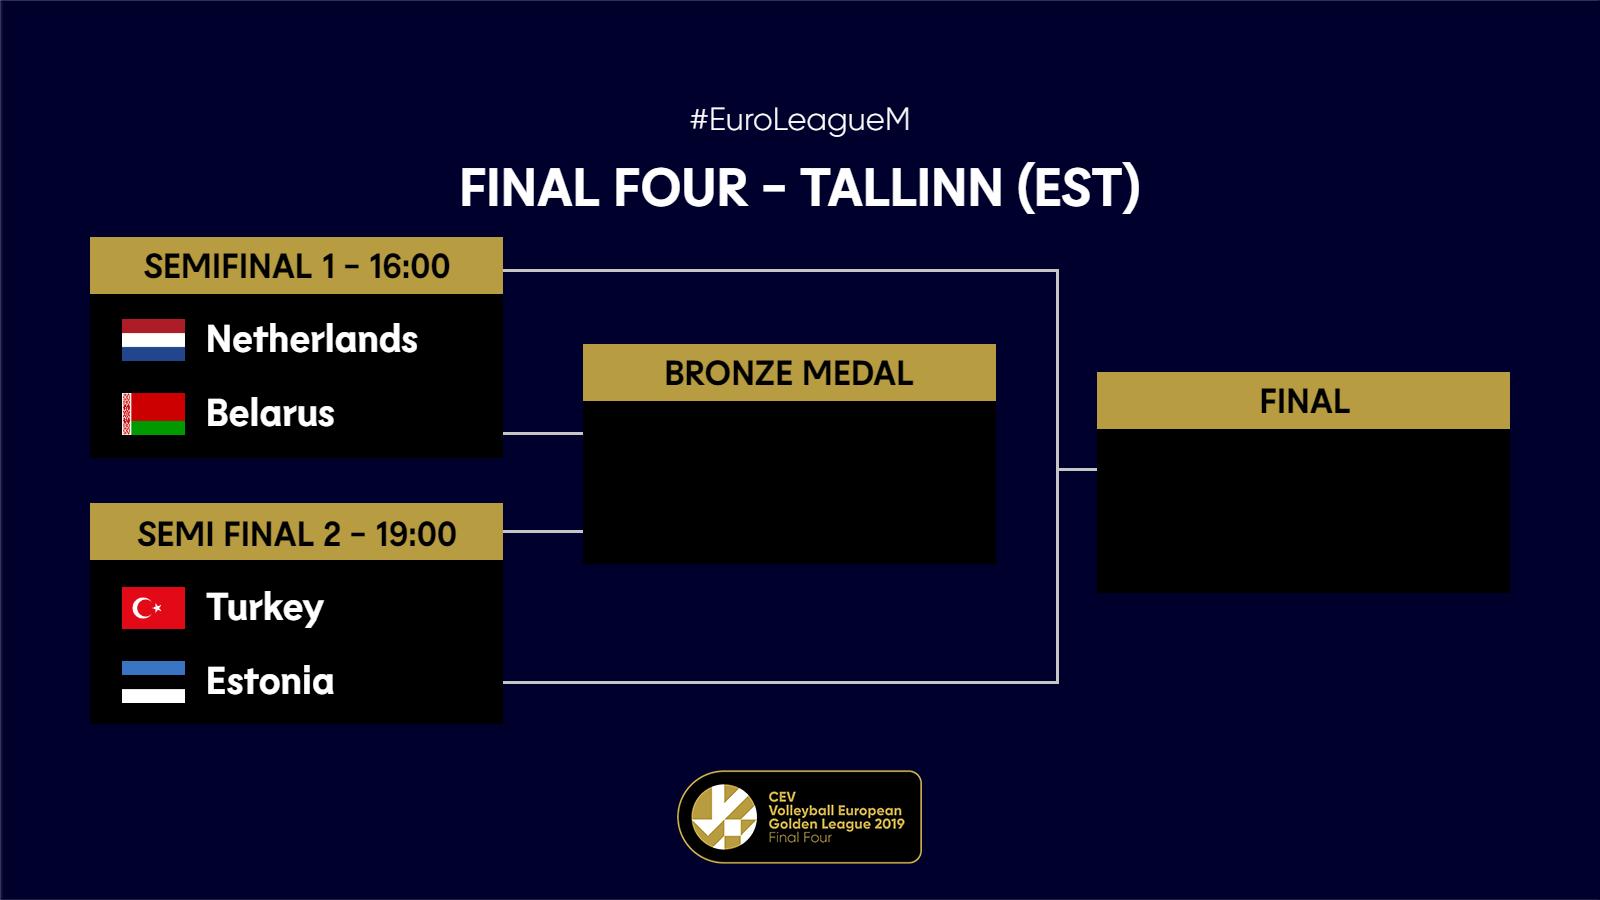 #GoldenEuropeanLeague: Belarus is the last participant on Final Four in Tallinn